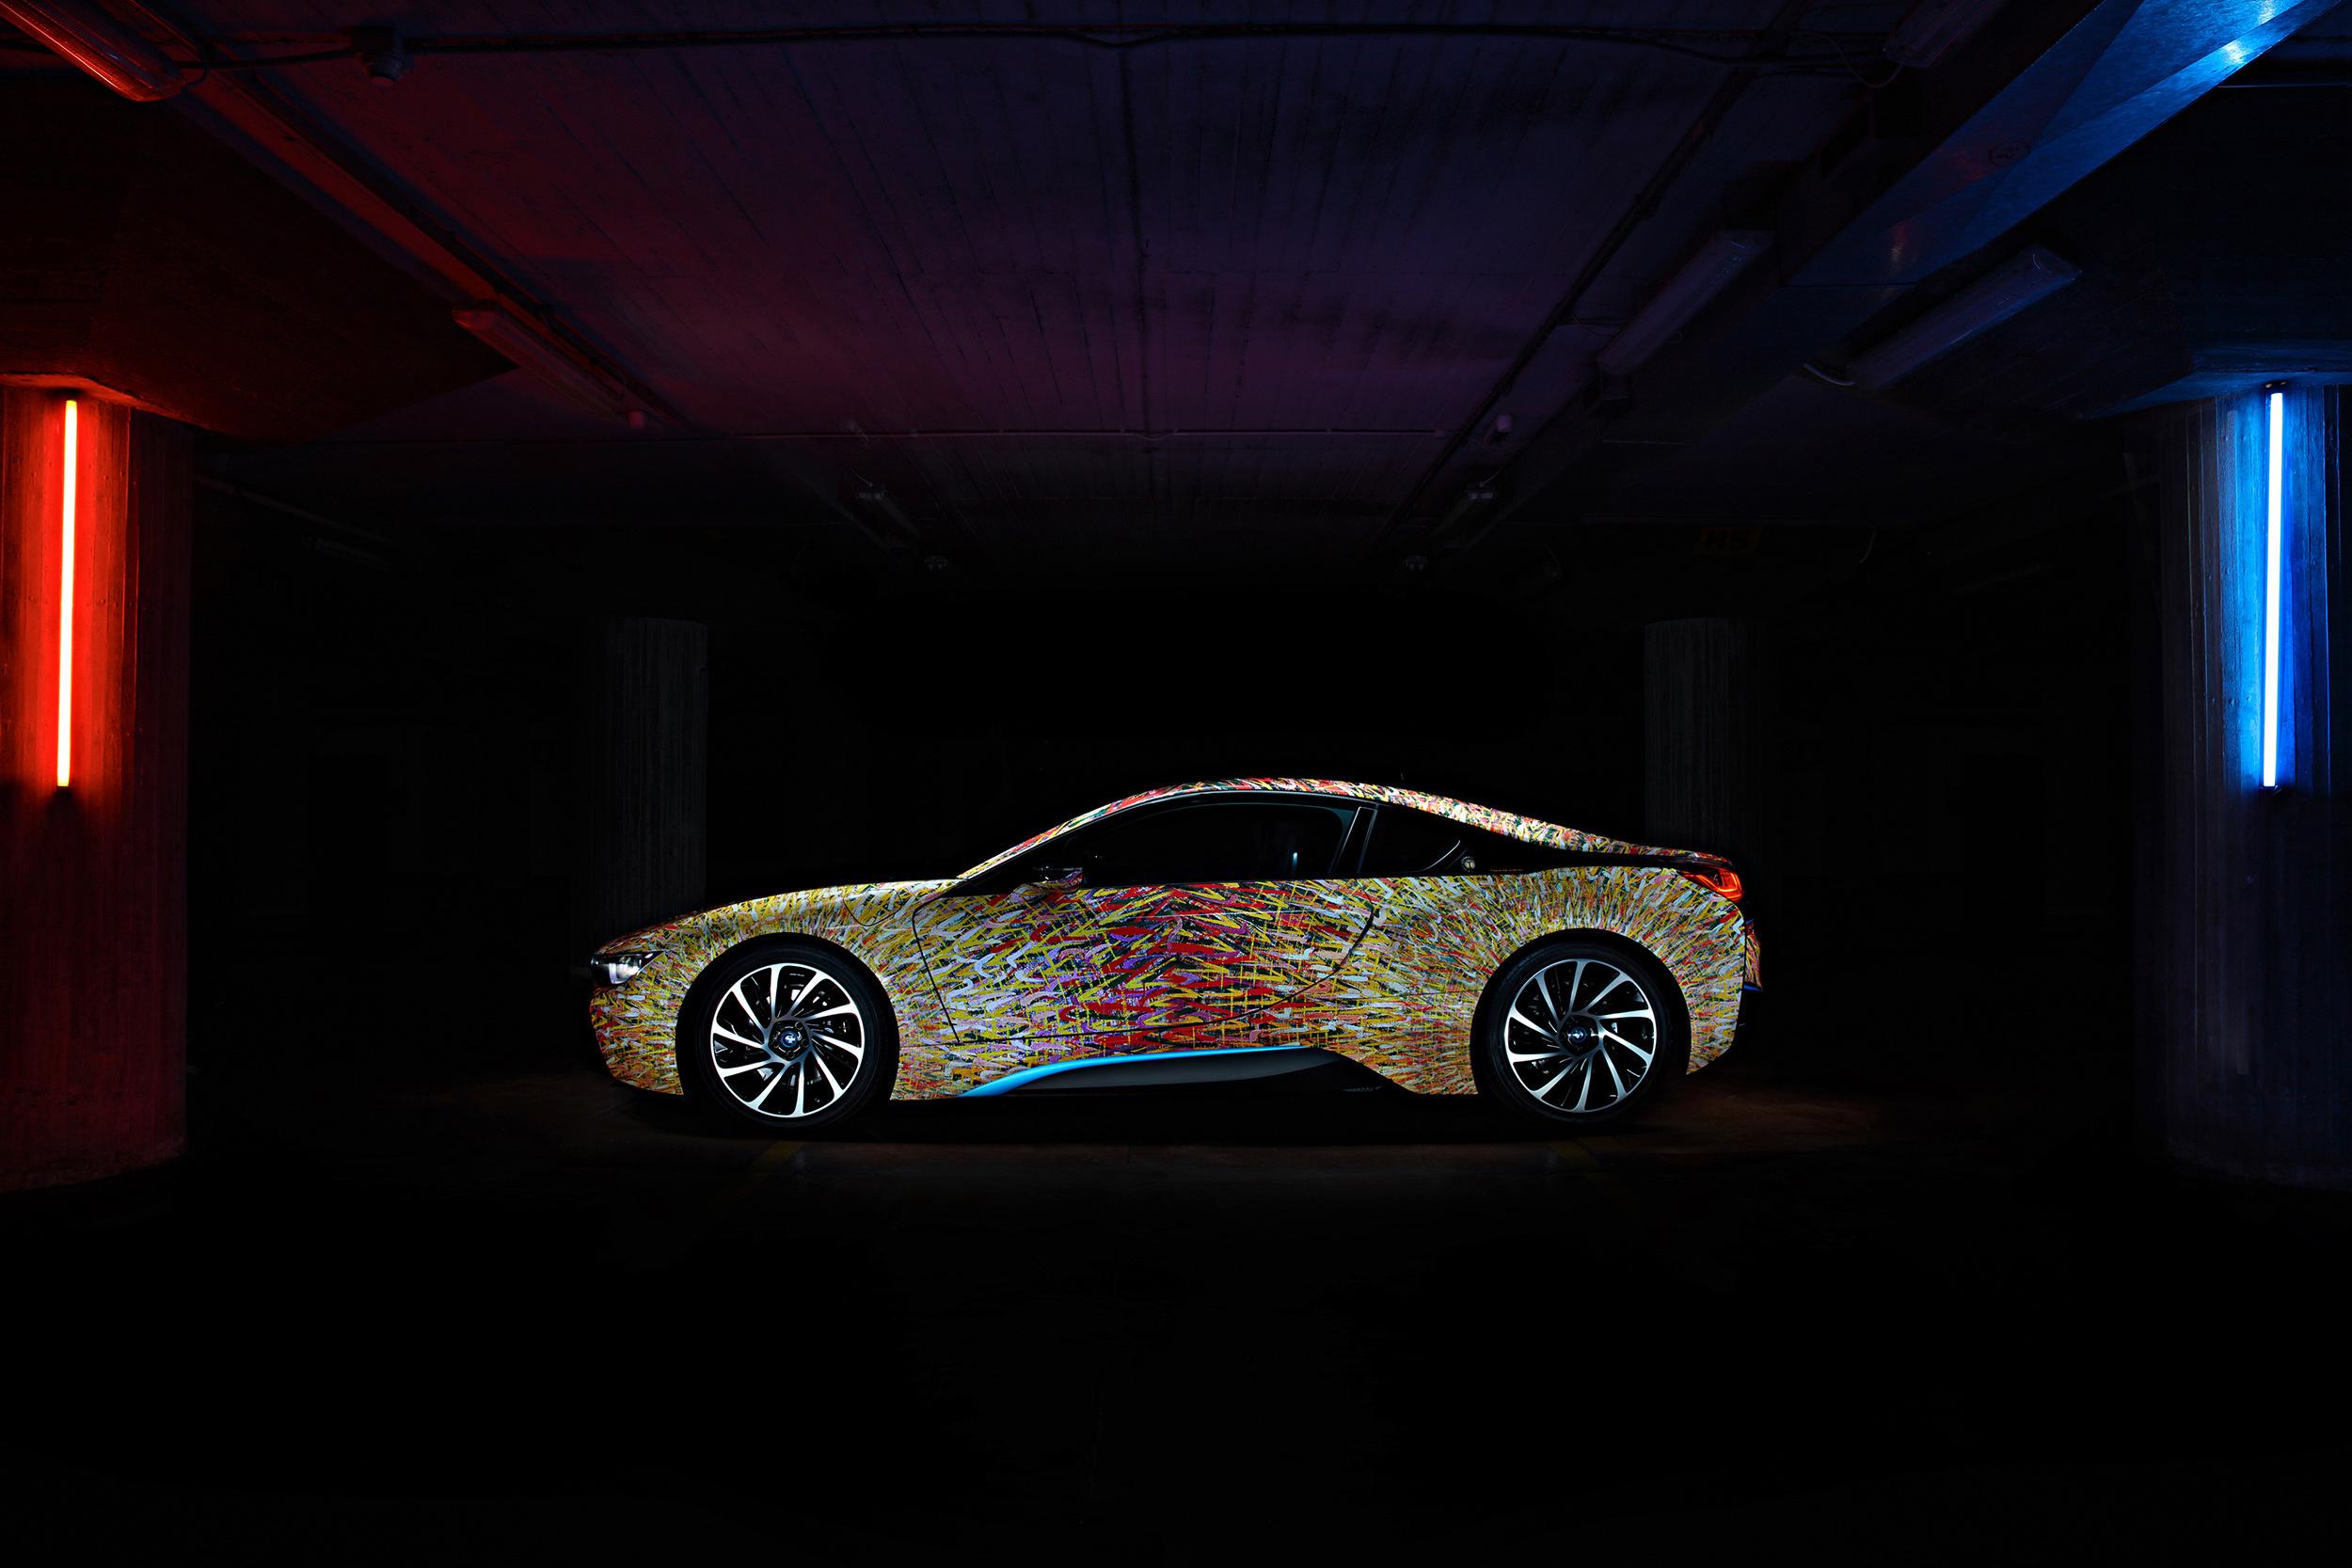 BMW I8 Futurism Edition Wallpaper